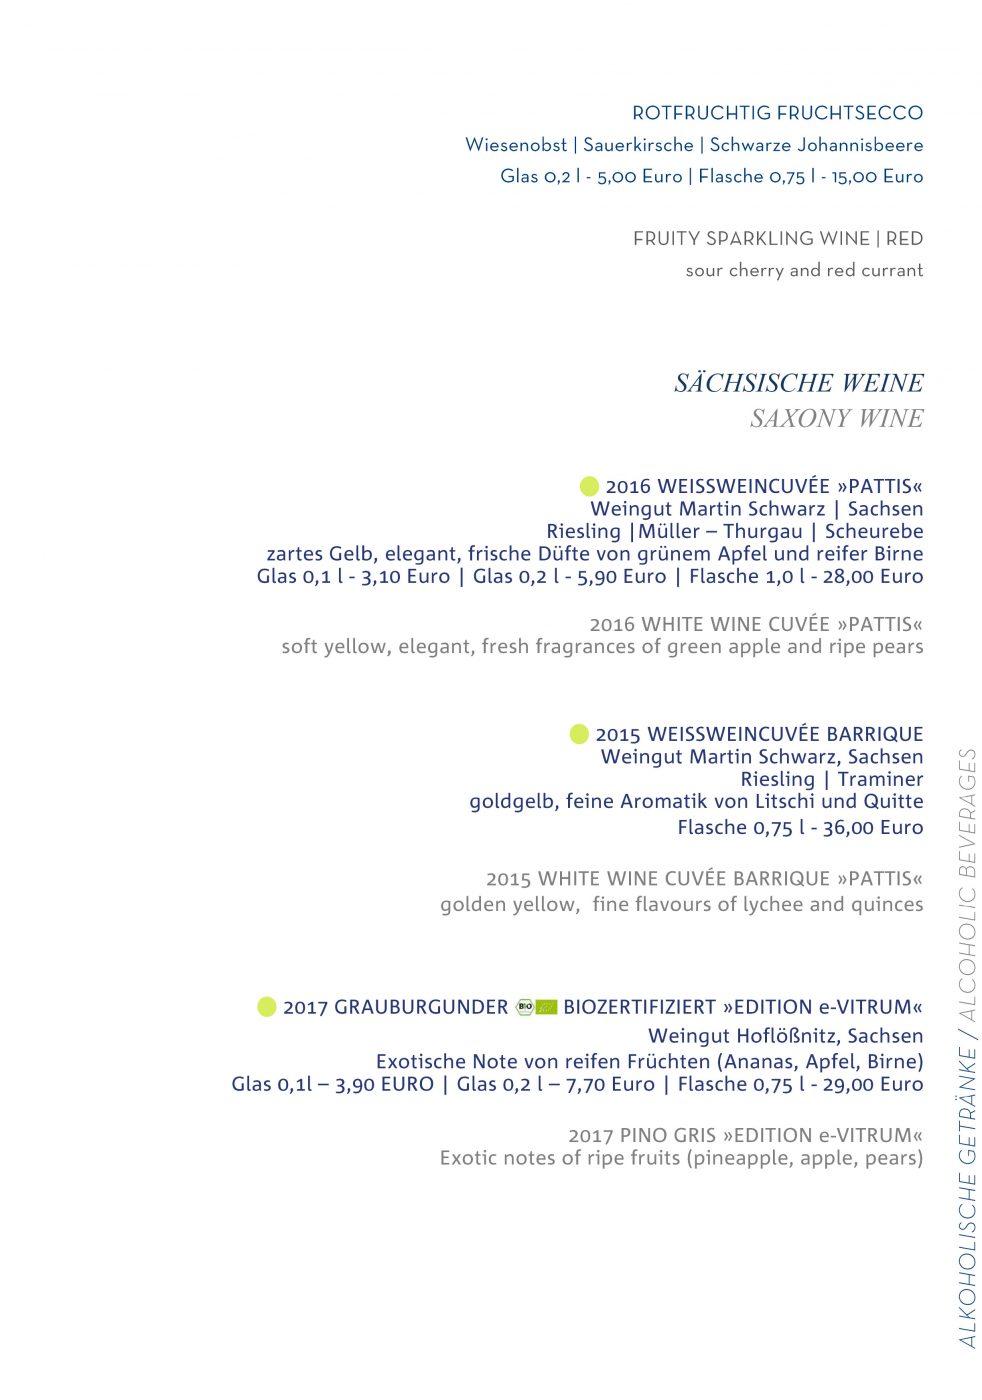 https://www.vitrum-dresden.de/wp-content/uploads/2019/03/3_AlkoholischeGetraenke_Februar_2-982x1400.jpg